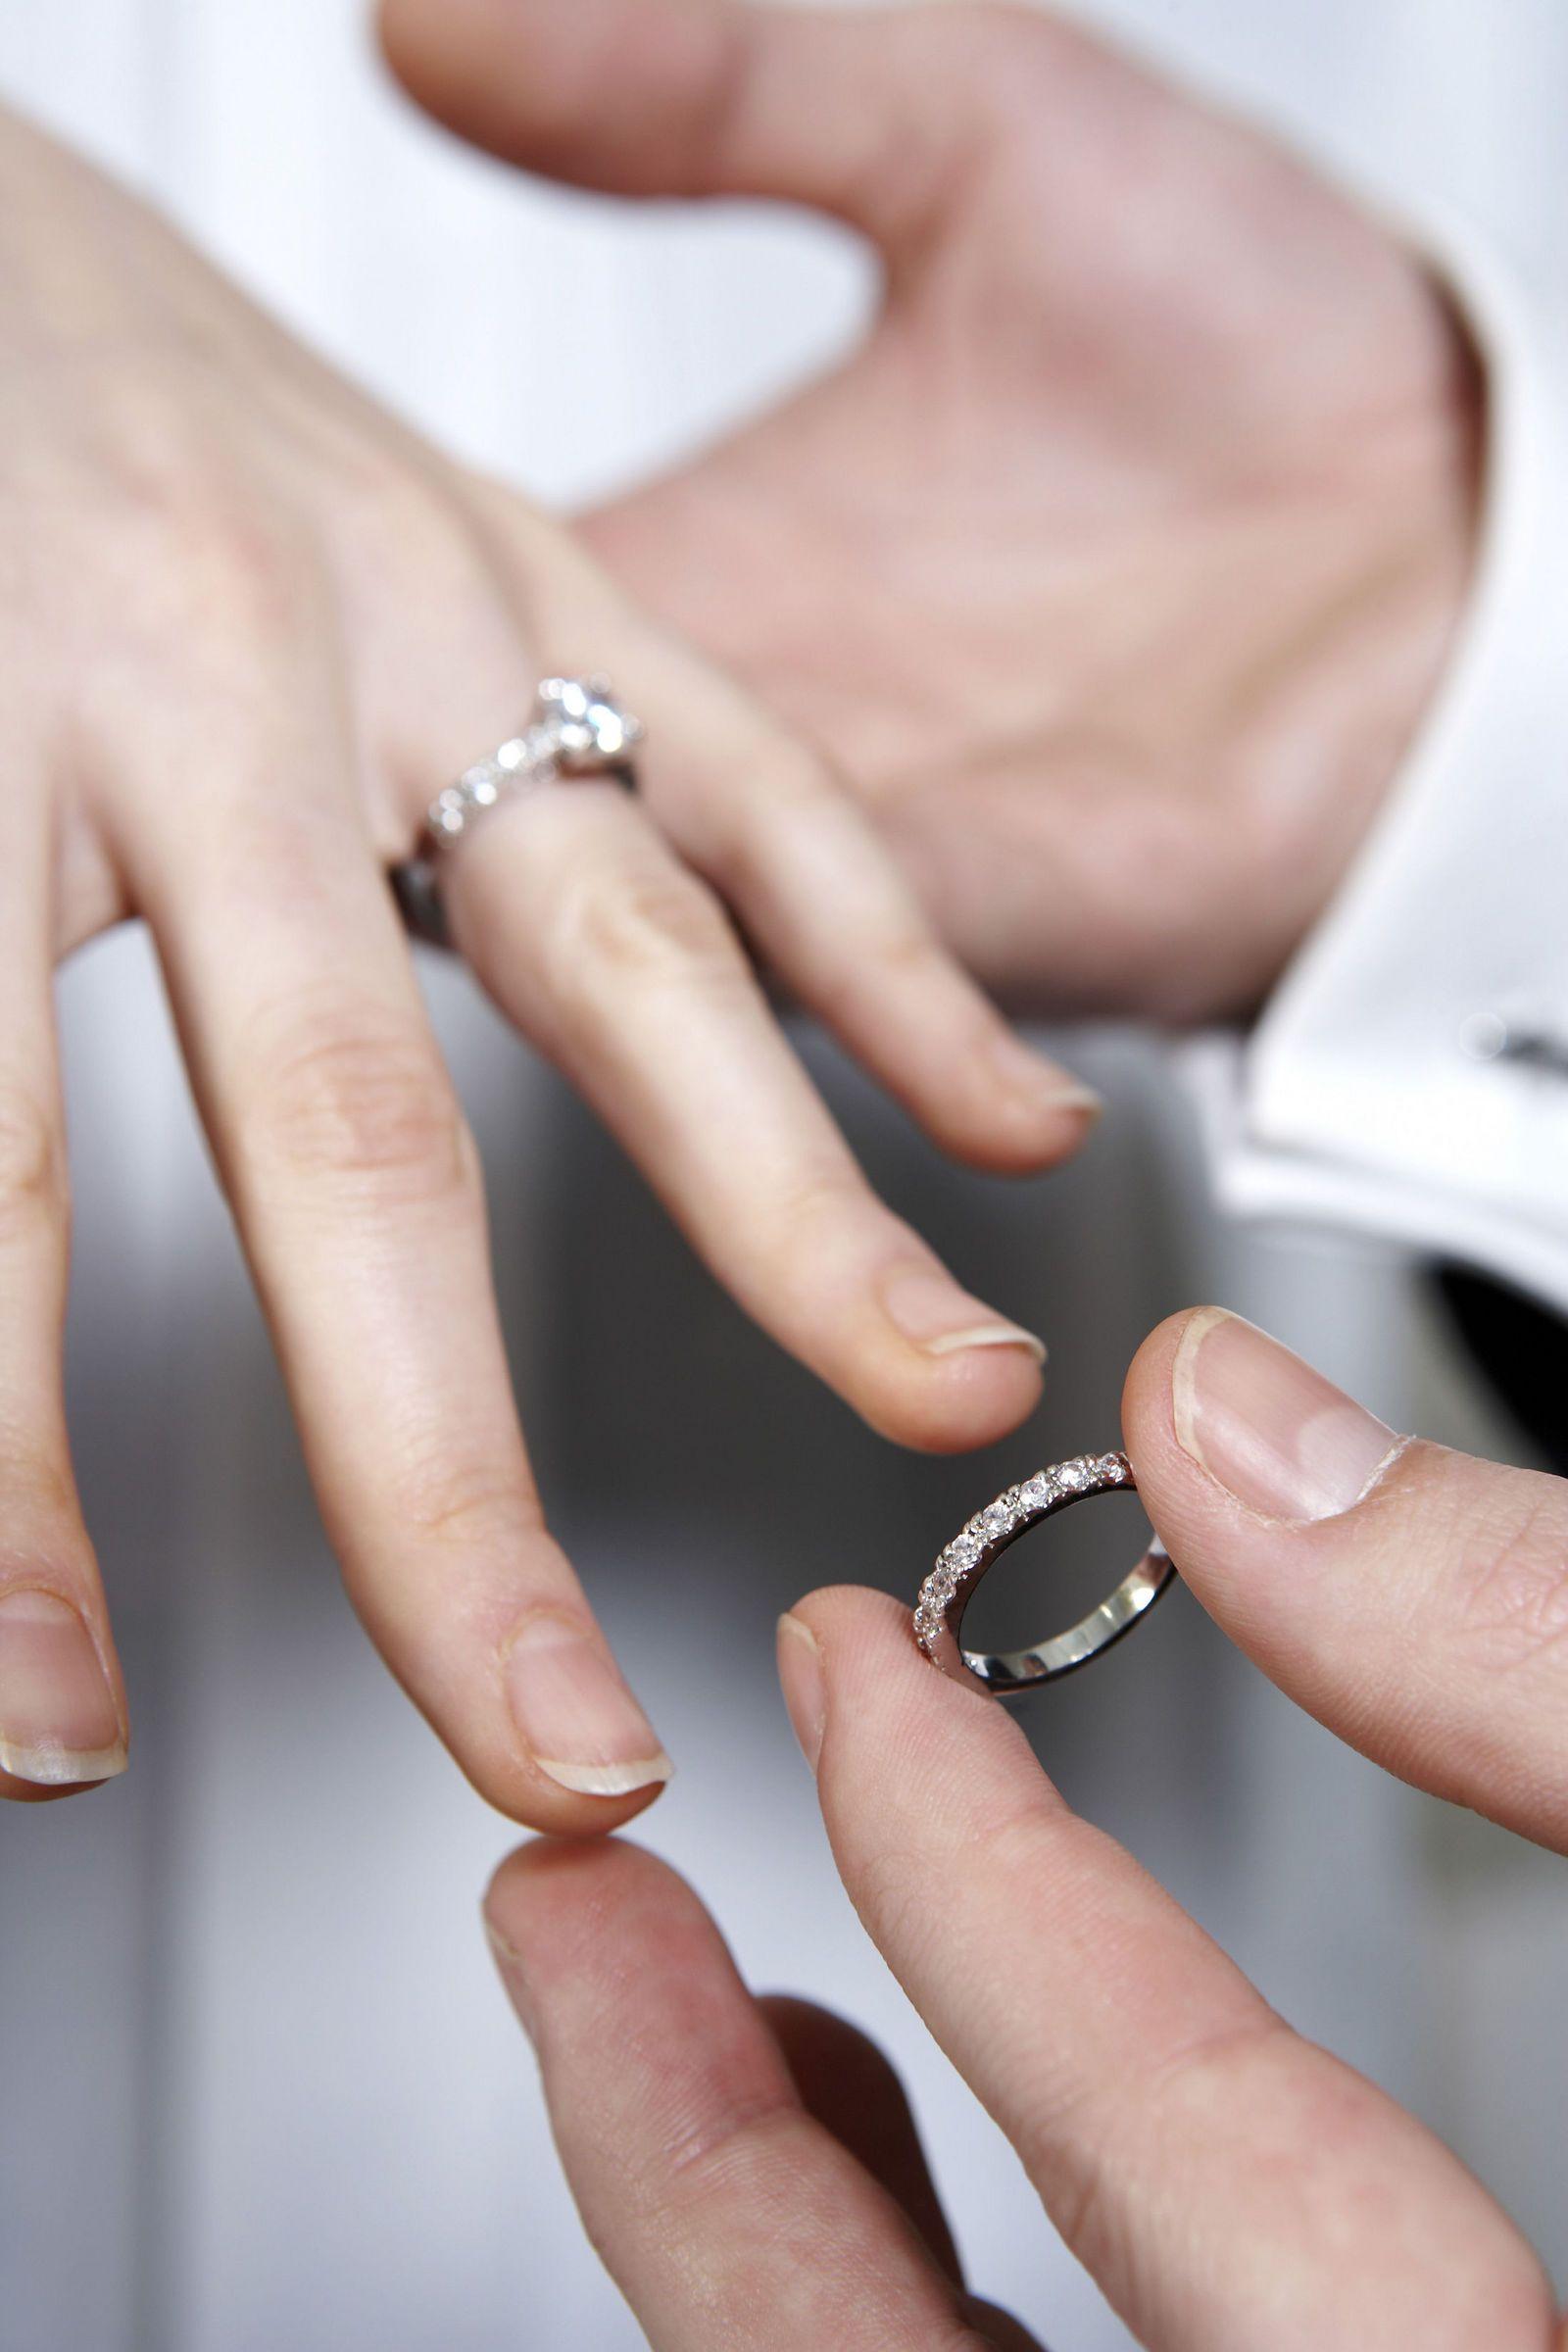 friday the 13th wedding - Google Search   Wedding photo ideas ...